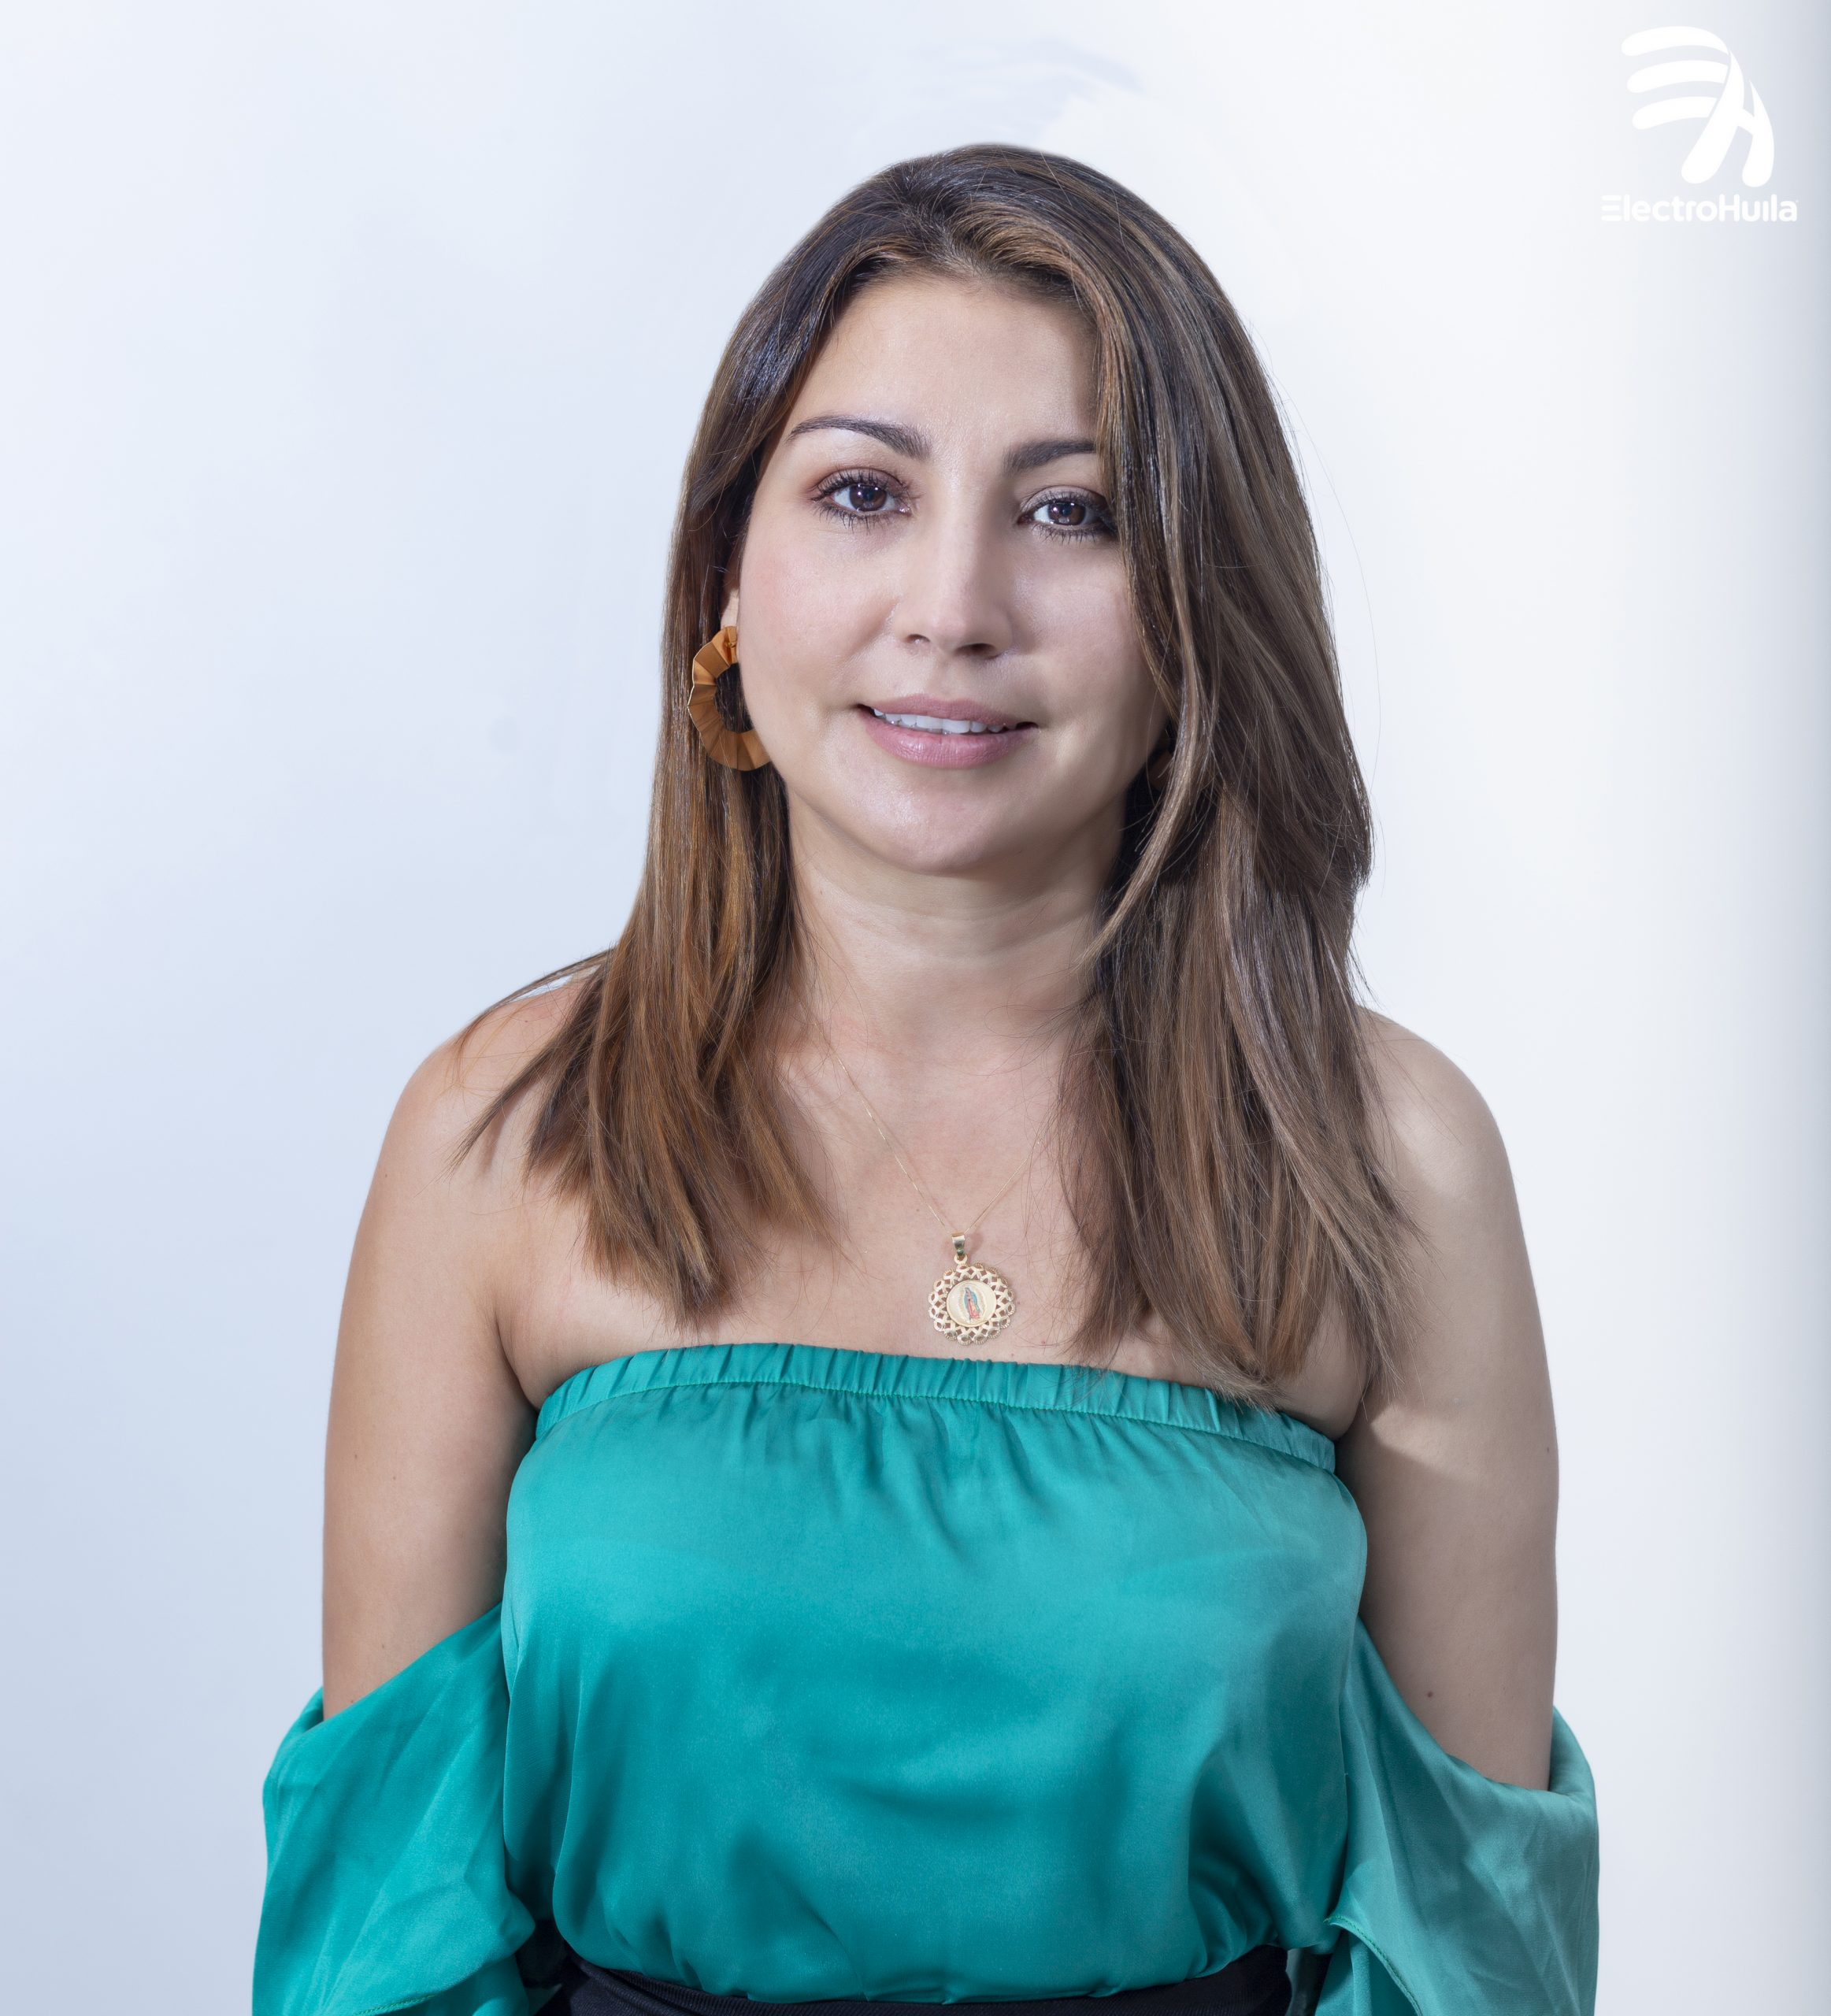 Lina María Guarnizo